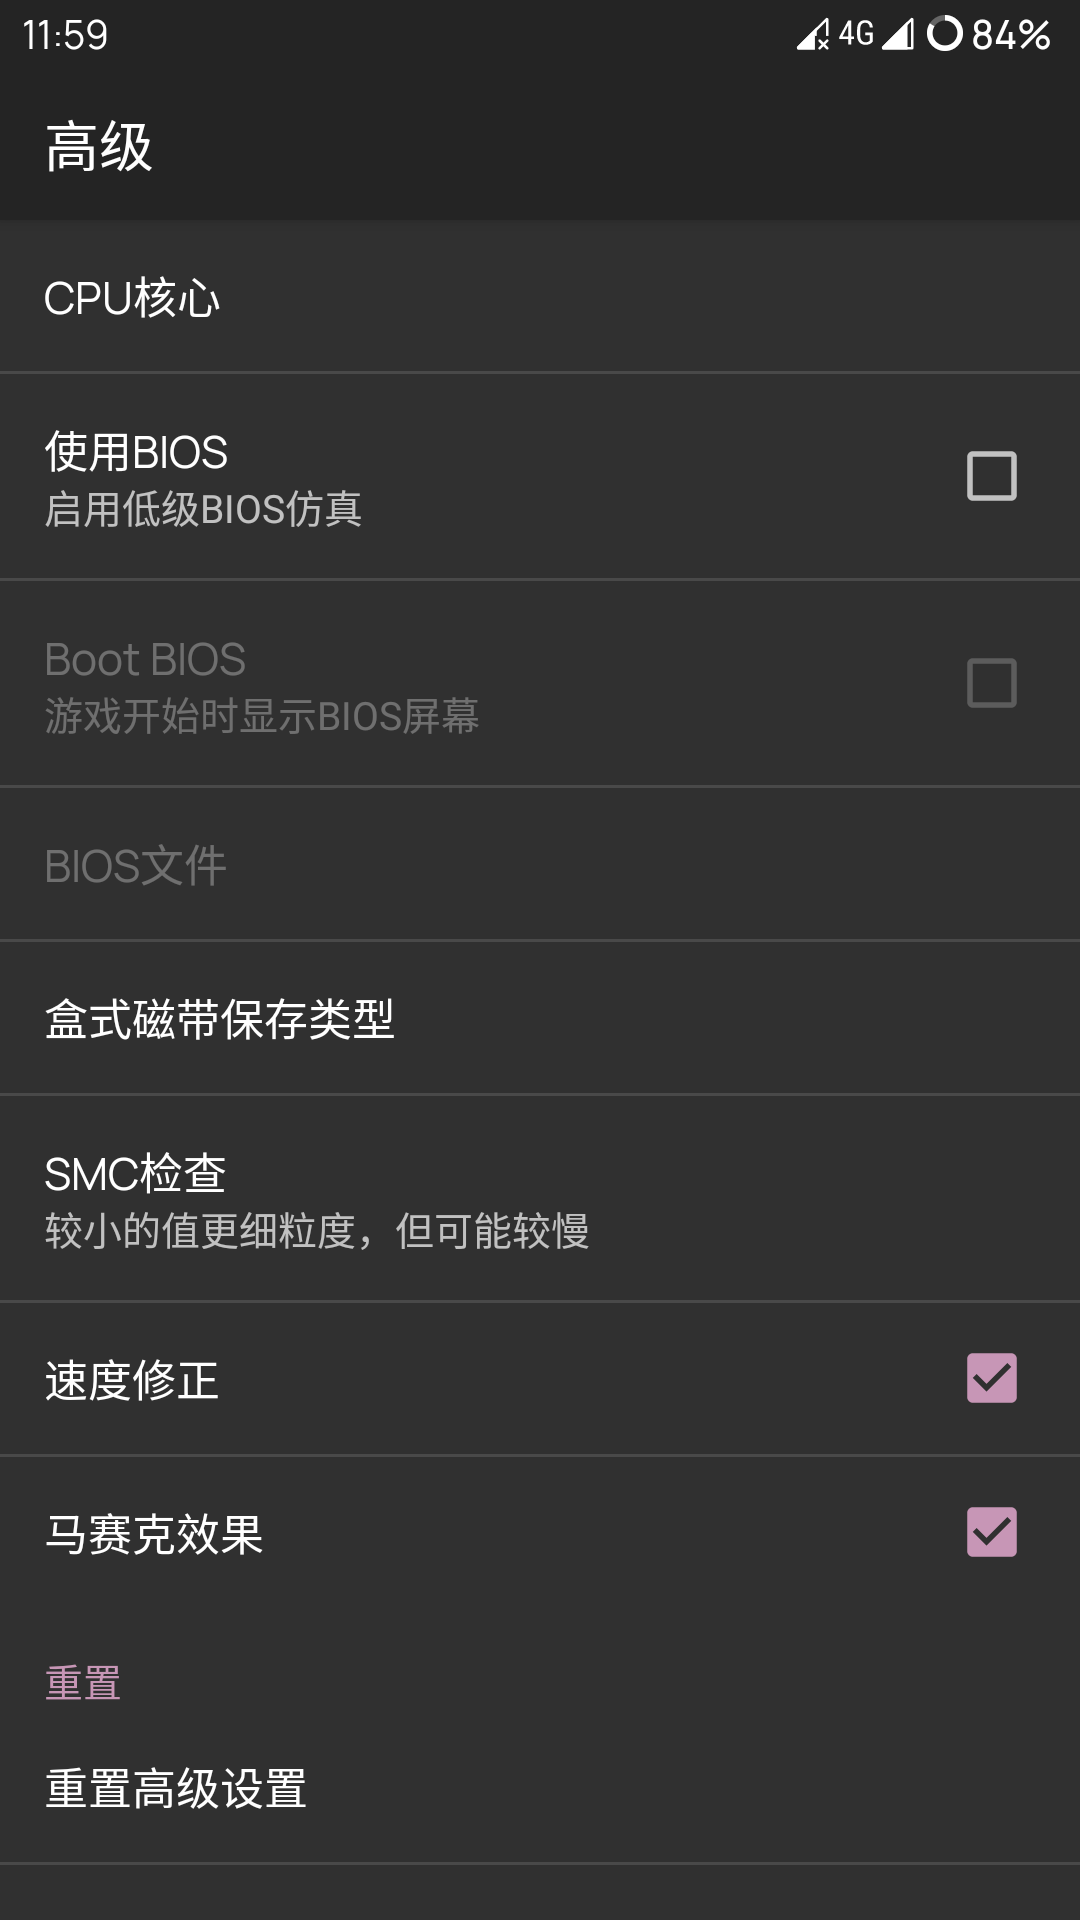 My Boy!/GBA模拟器汉化版V1.8.0.1_安卓